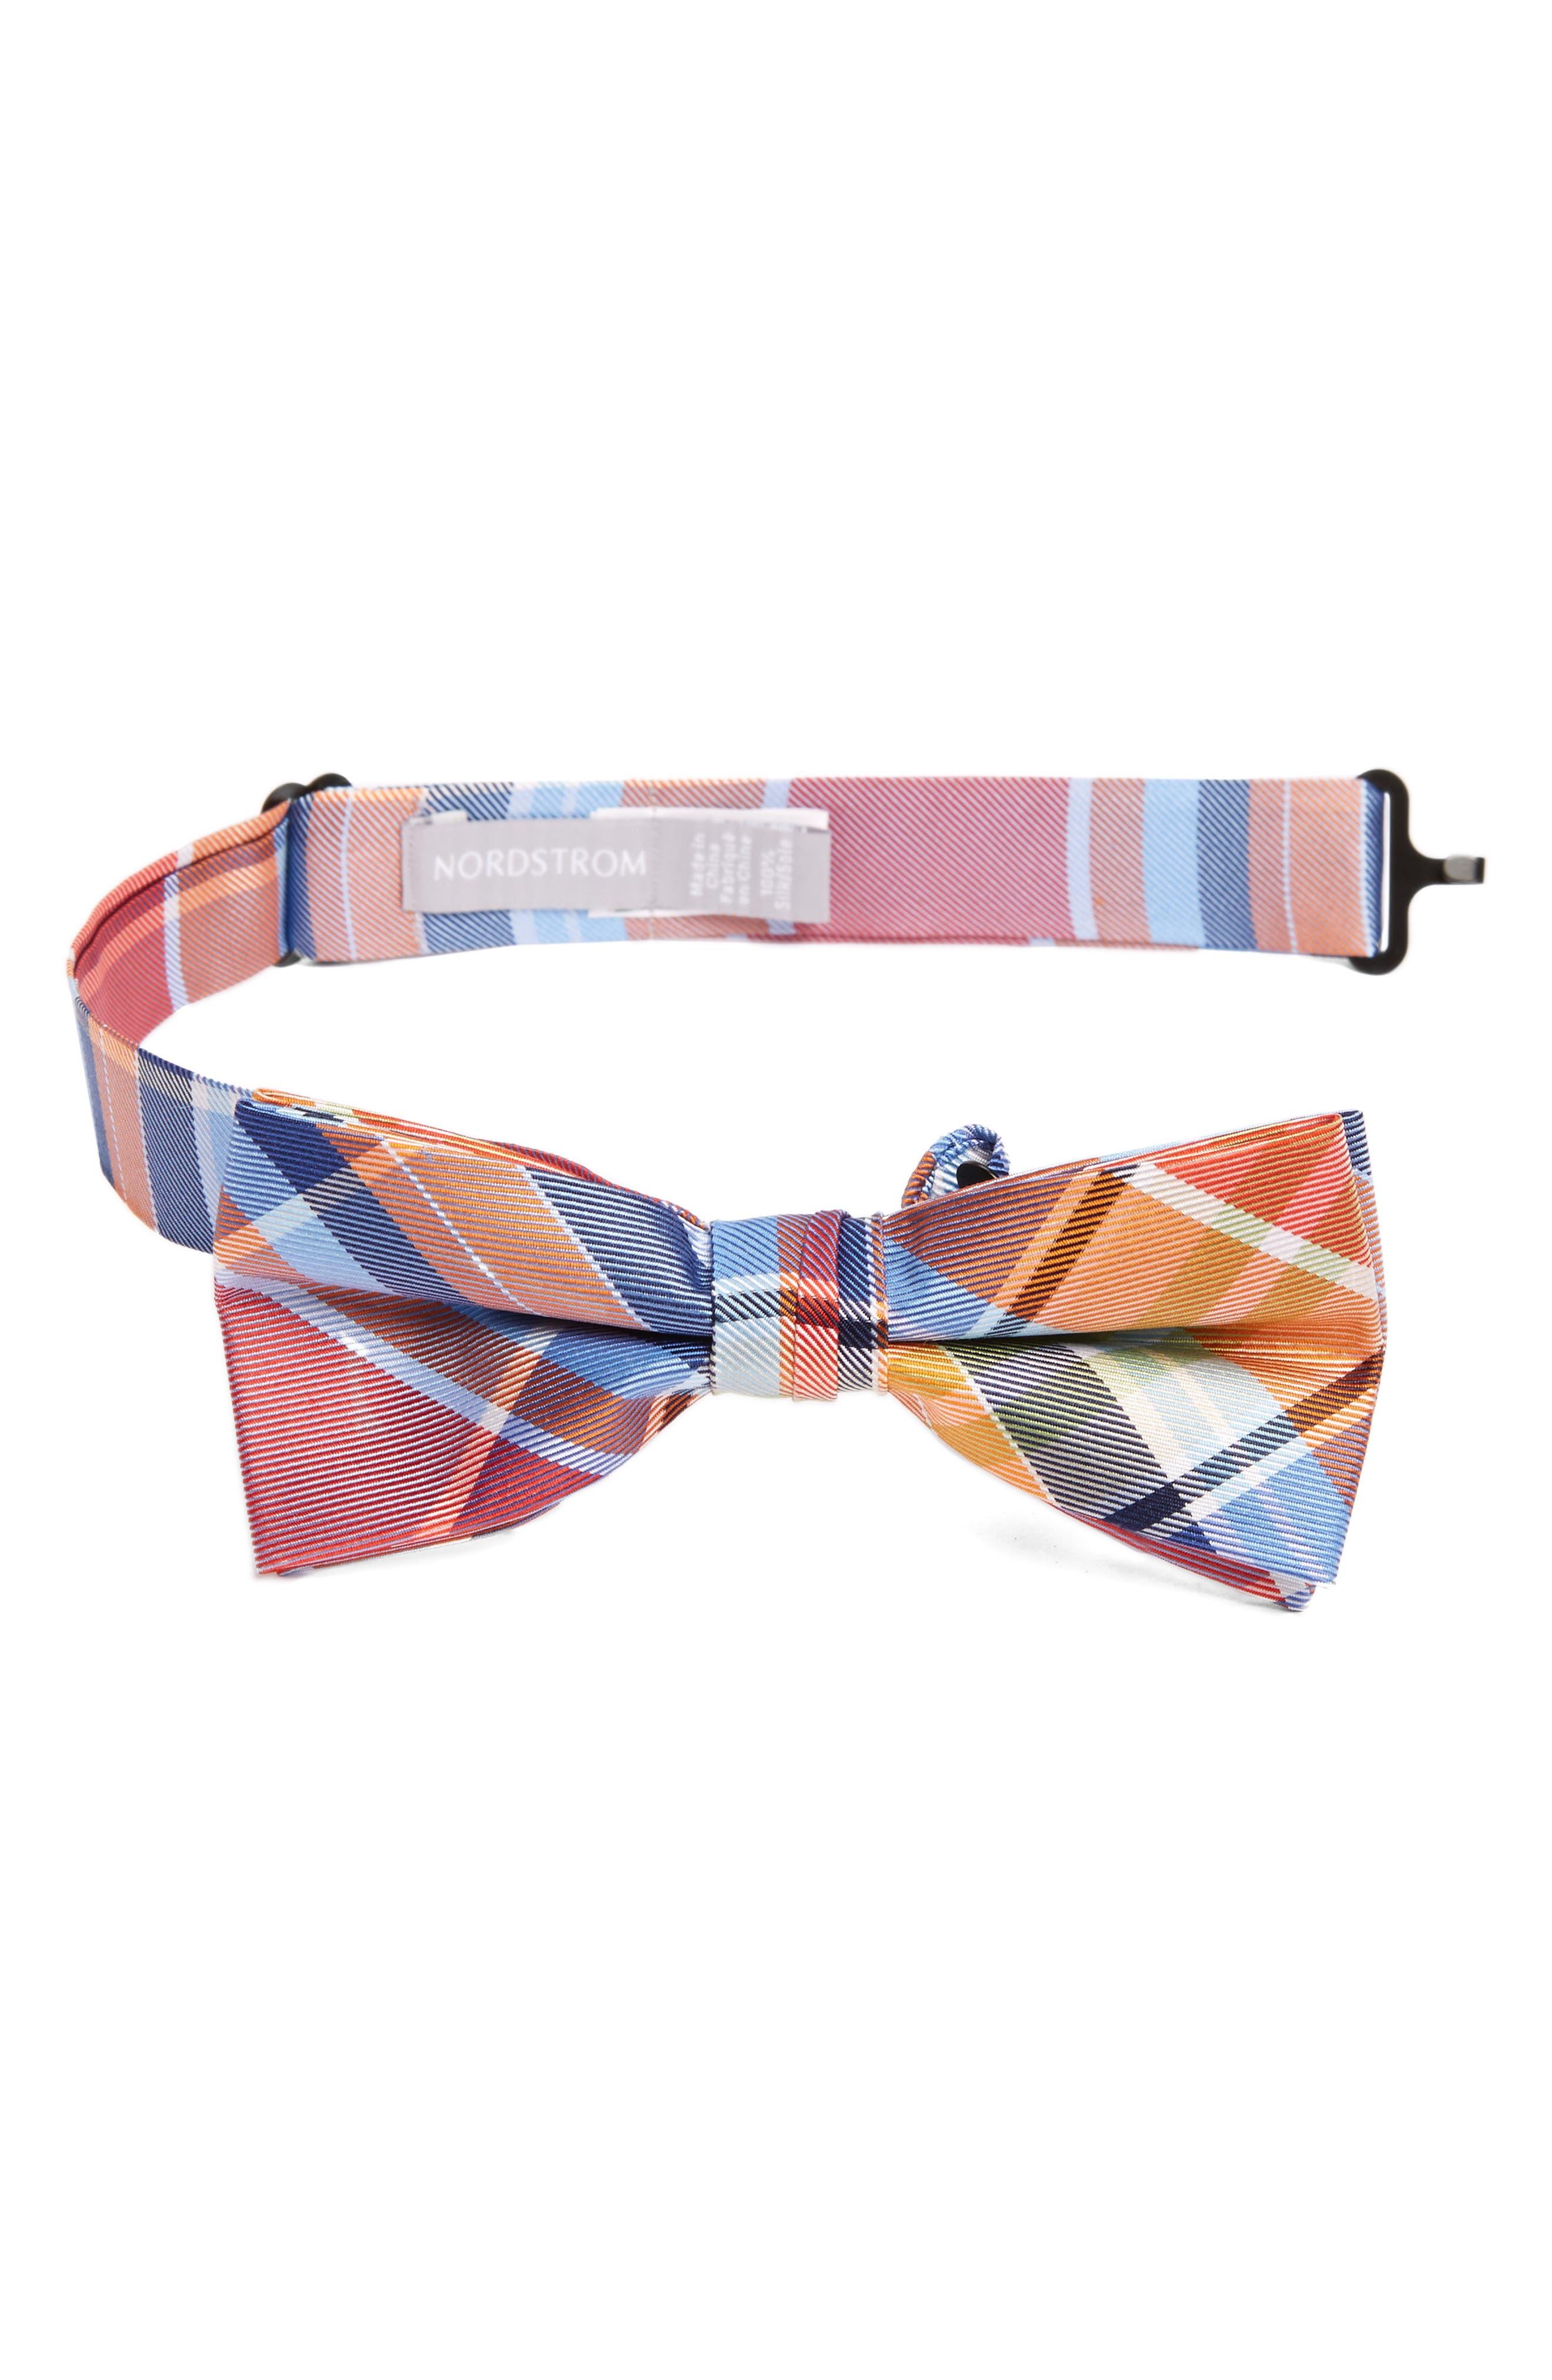 Nordstrom Plaid Silk Bow Tie (Big Boys)